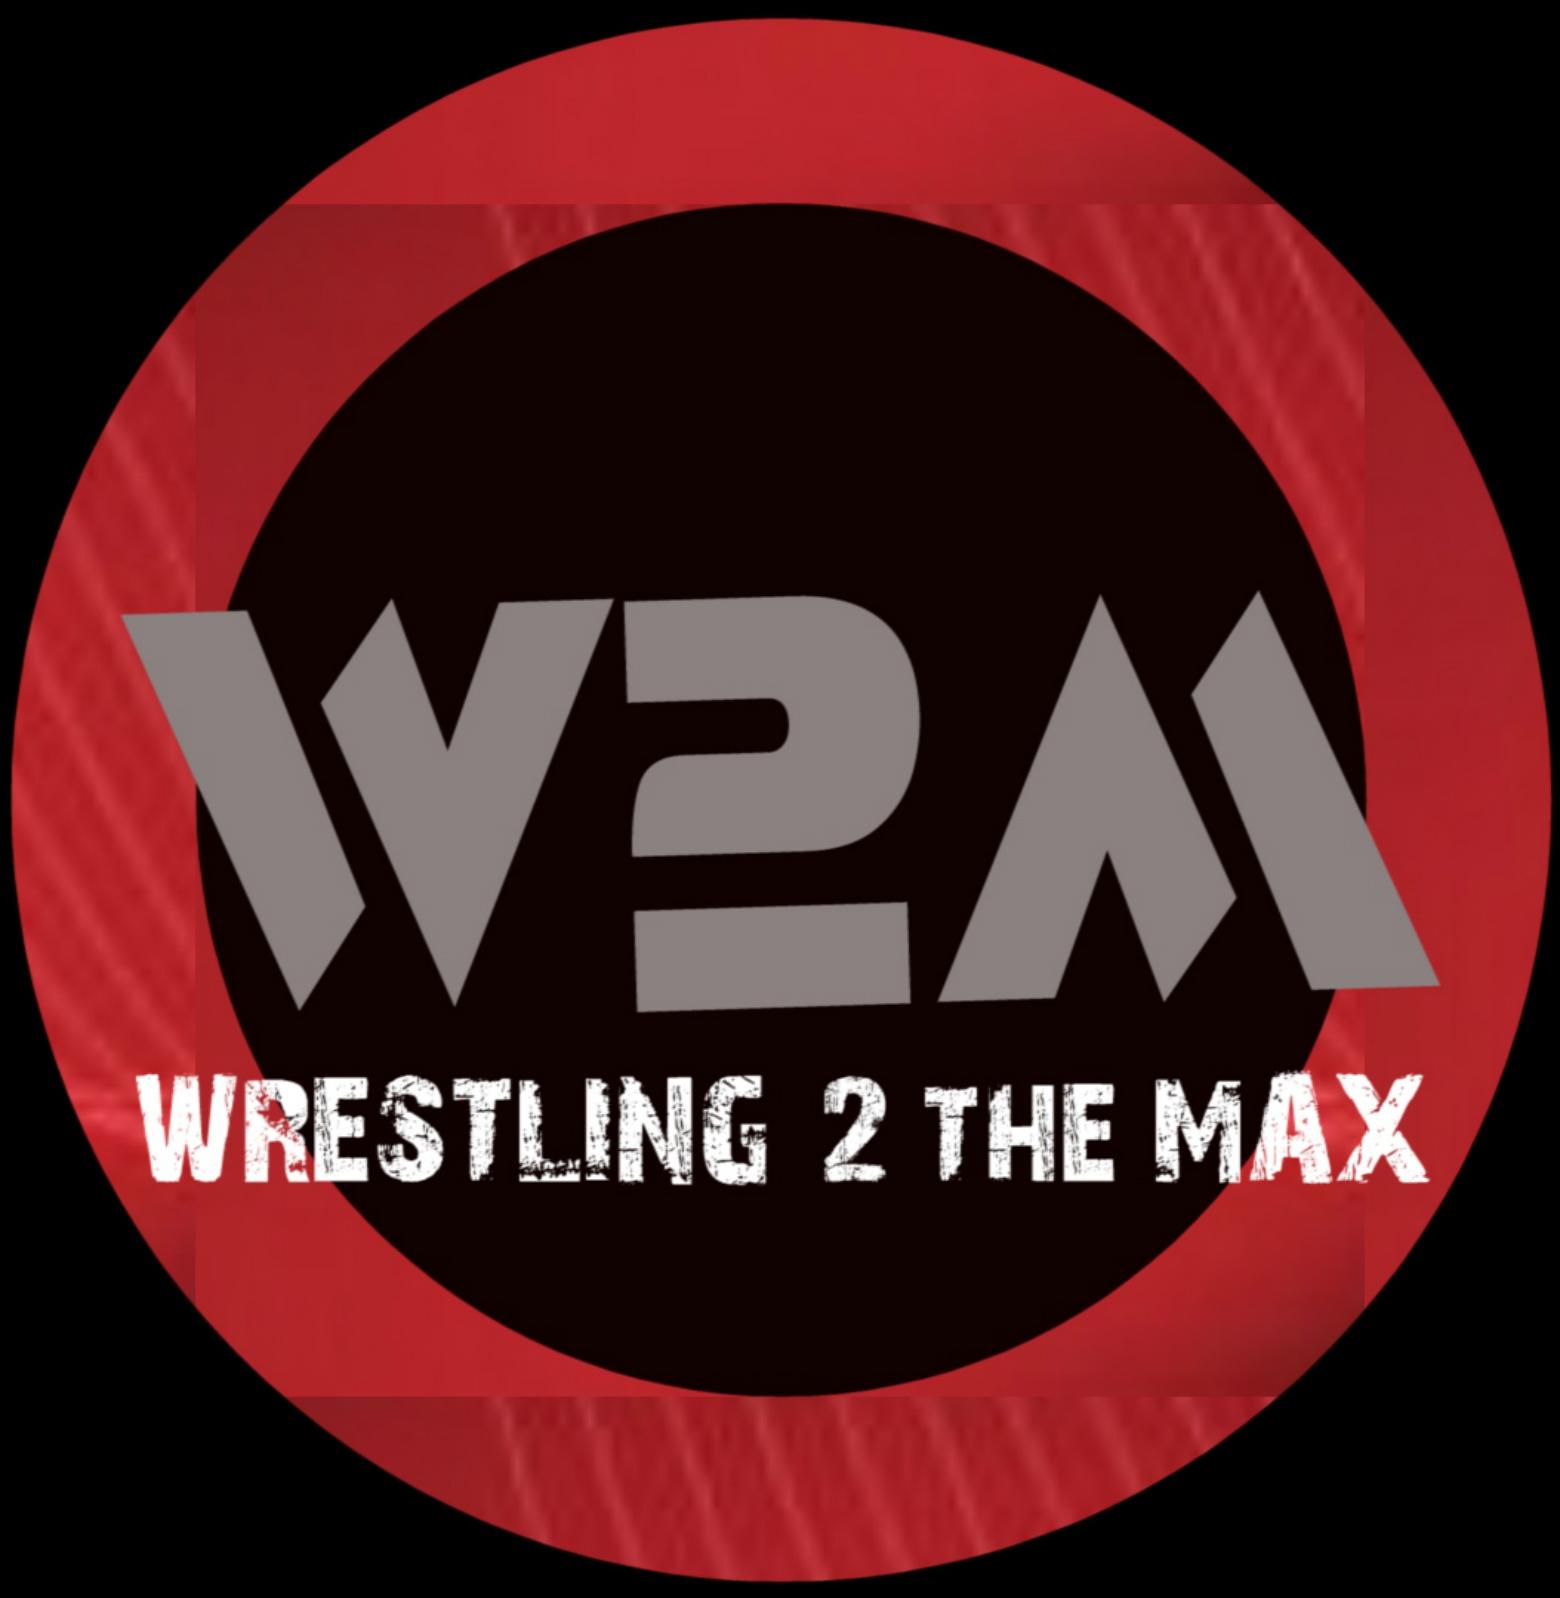 Wrestling 2 the MAX